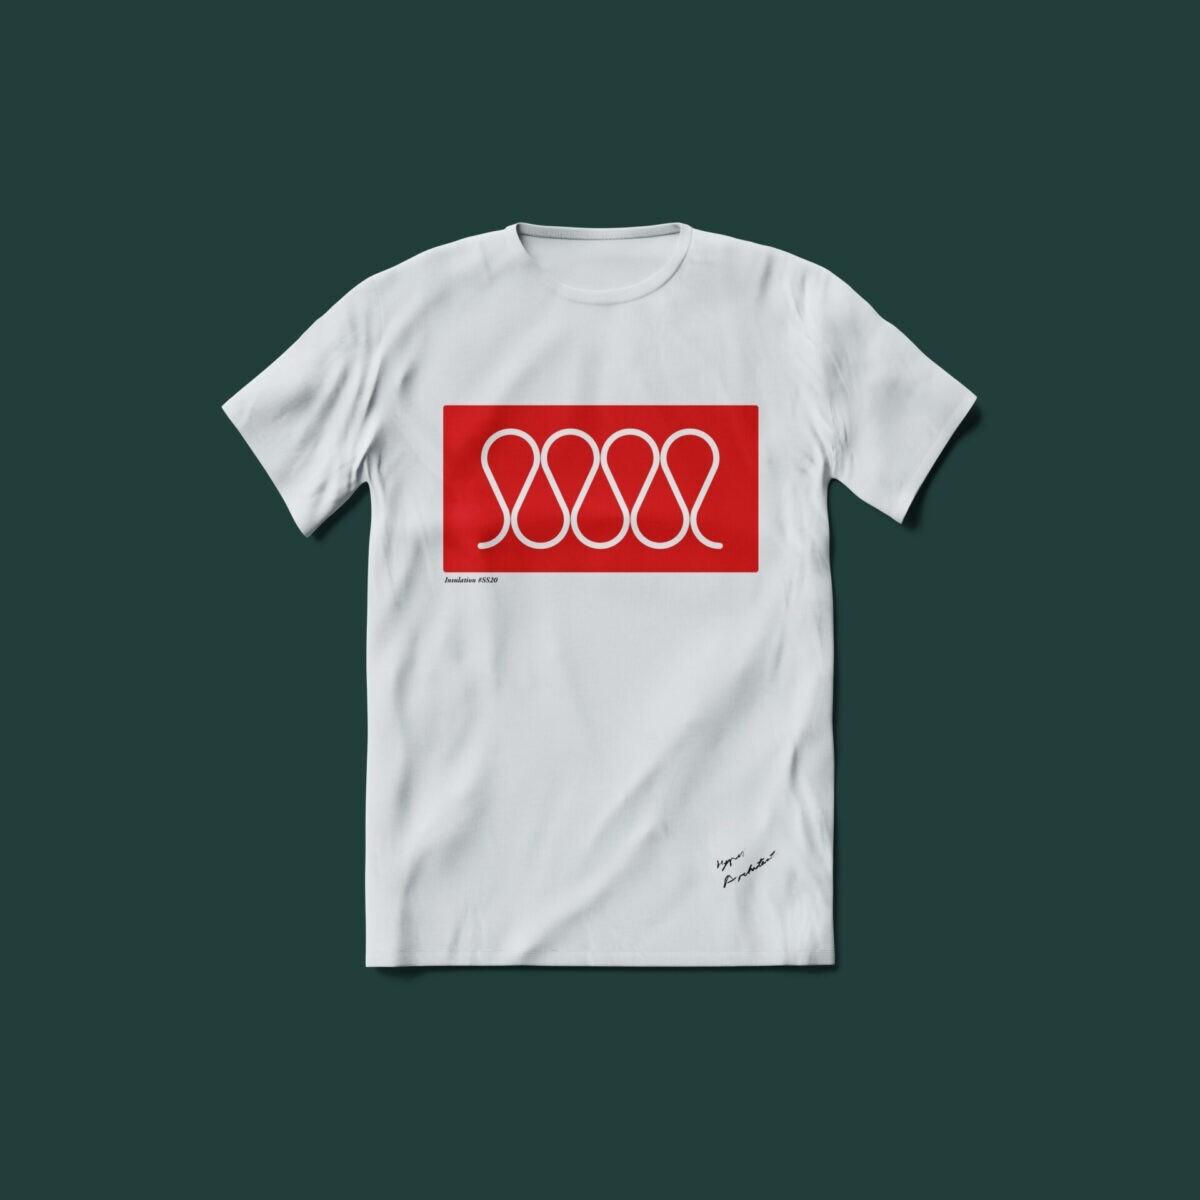 Hyperarchitects clothing t shirt insulation